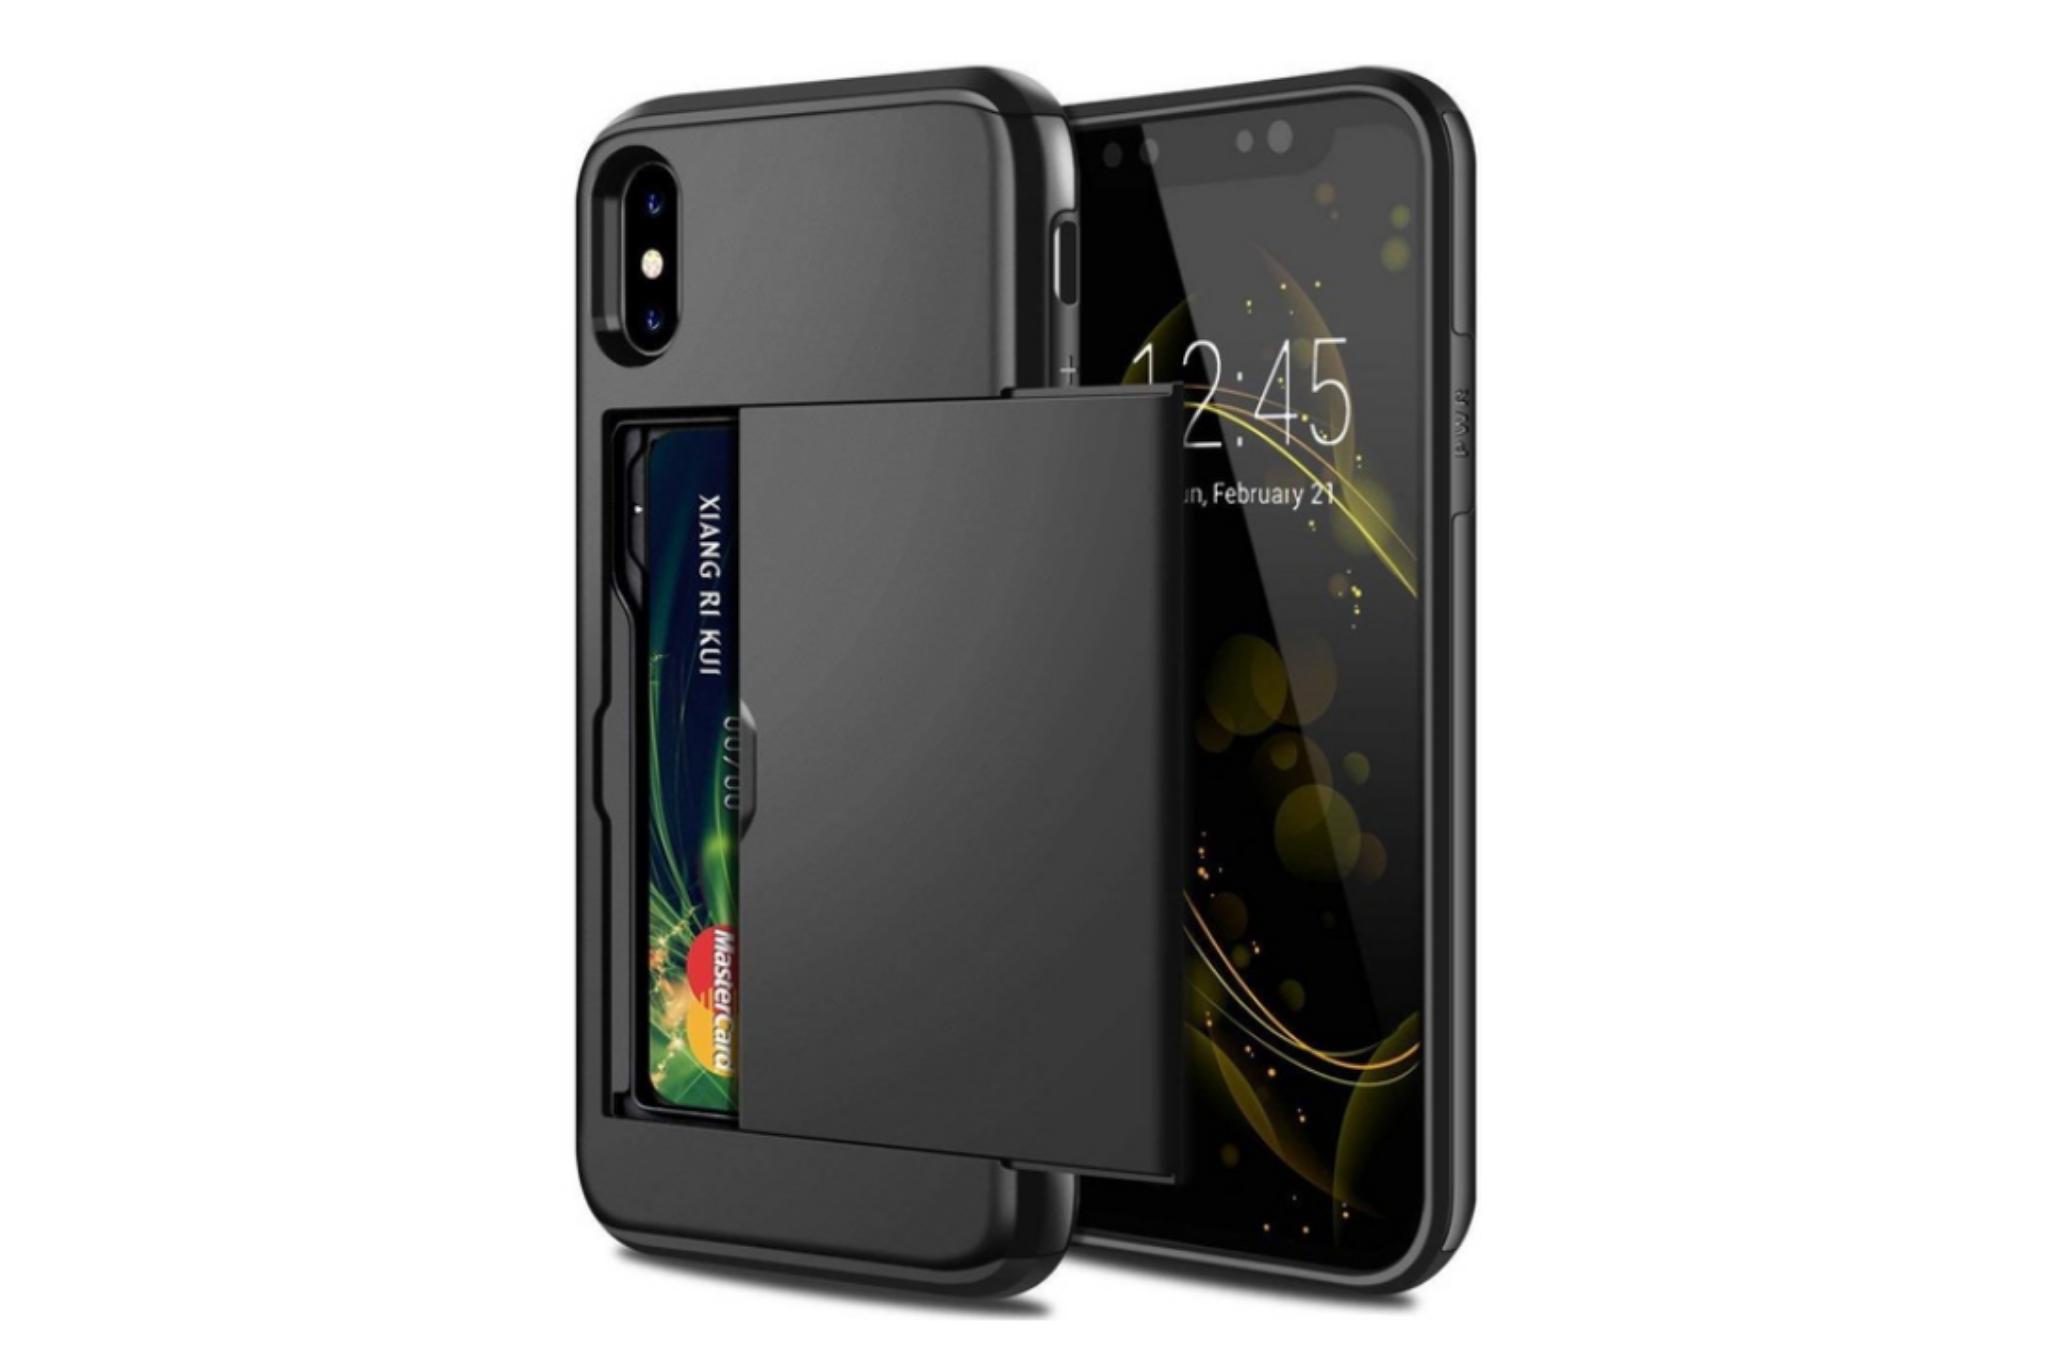 Smartphonehoesje iPhone XR | Pasjesschuif zwart